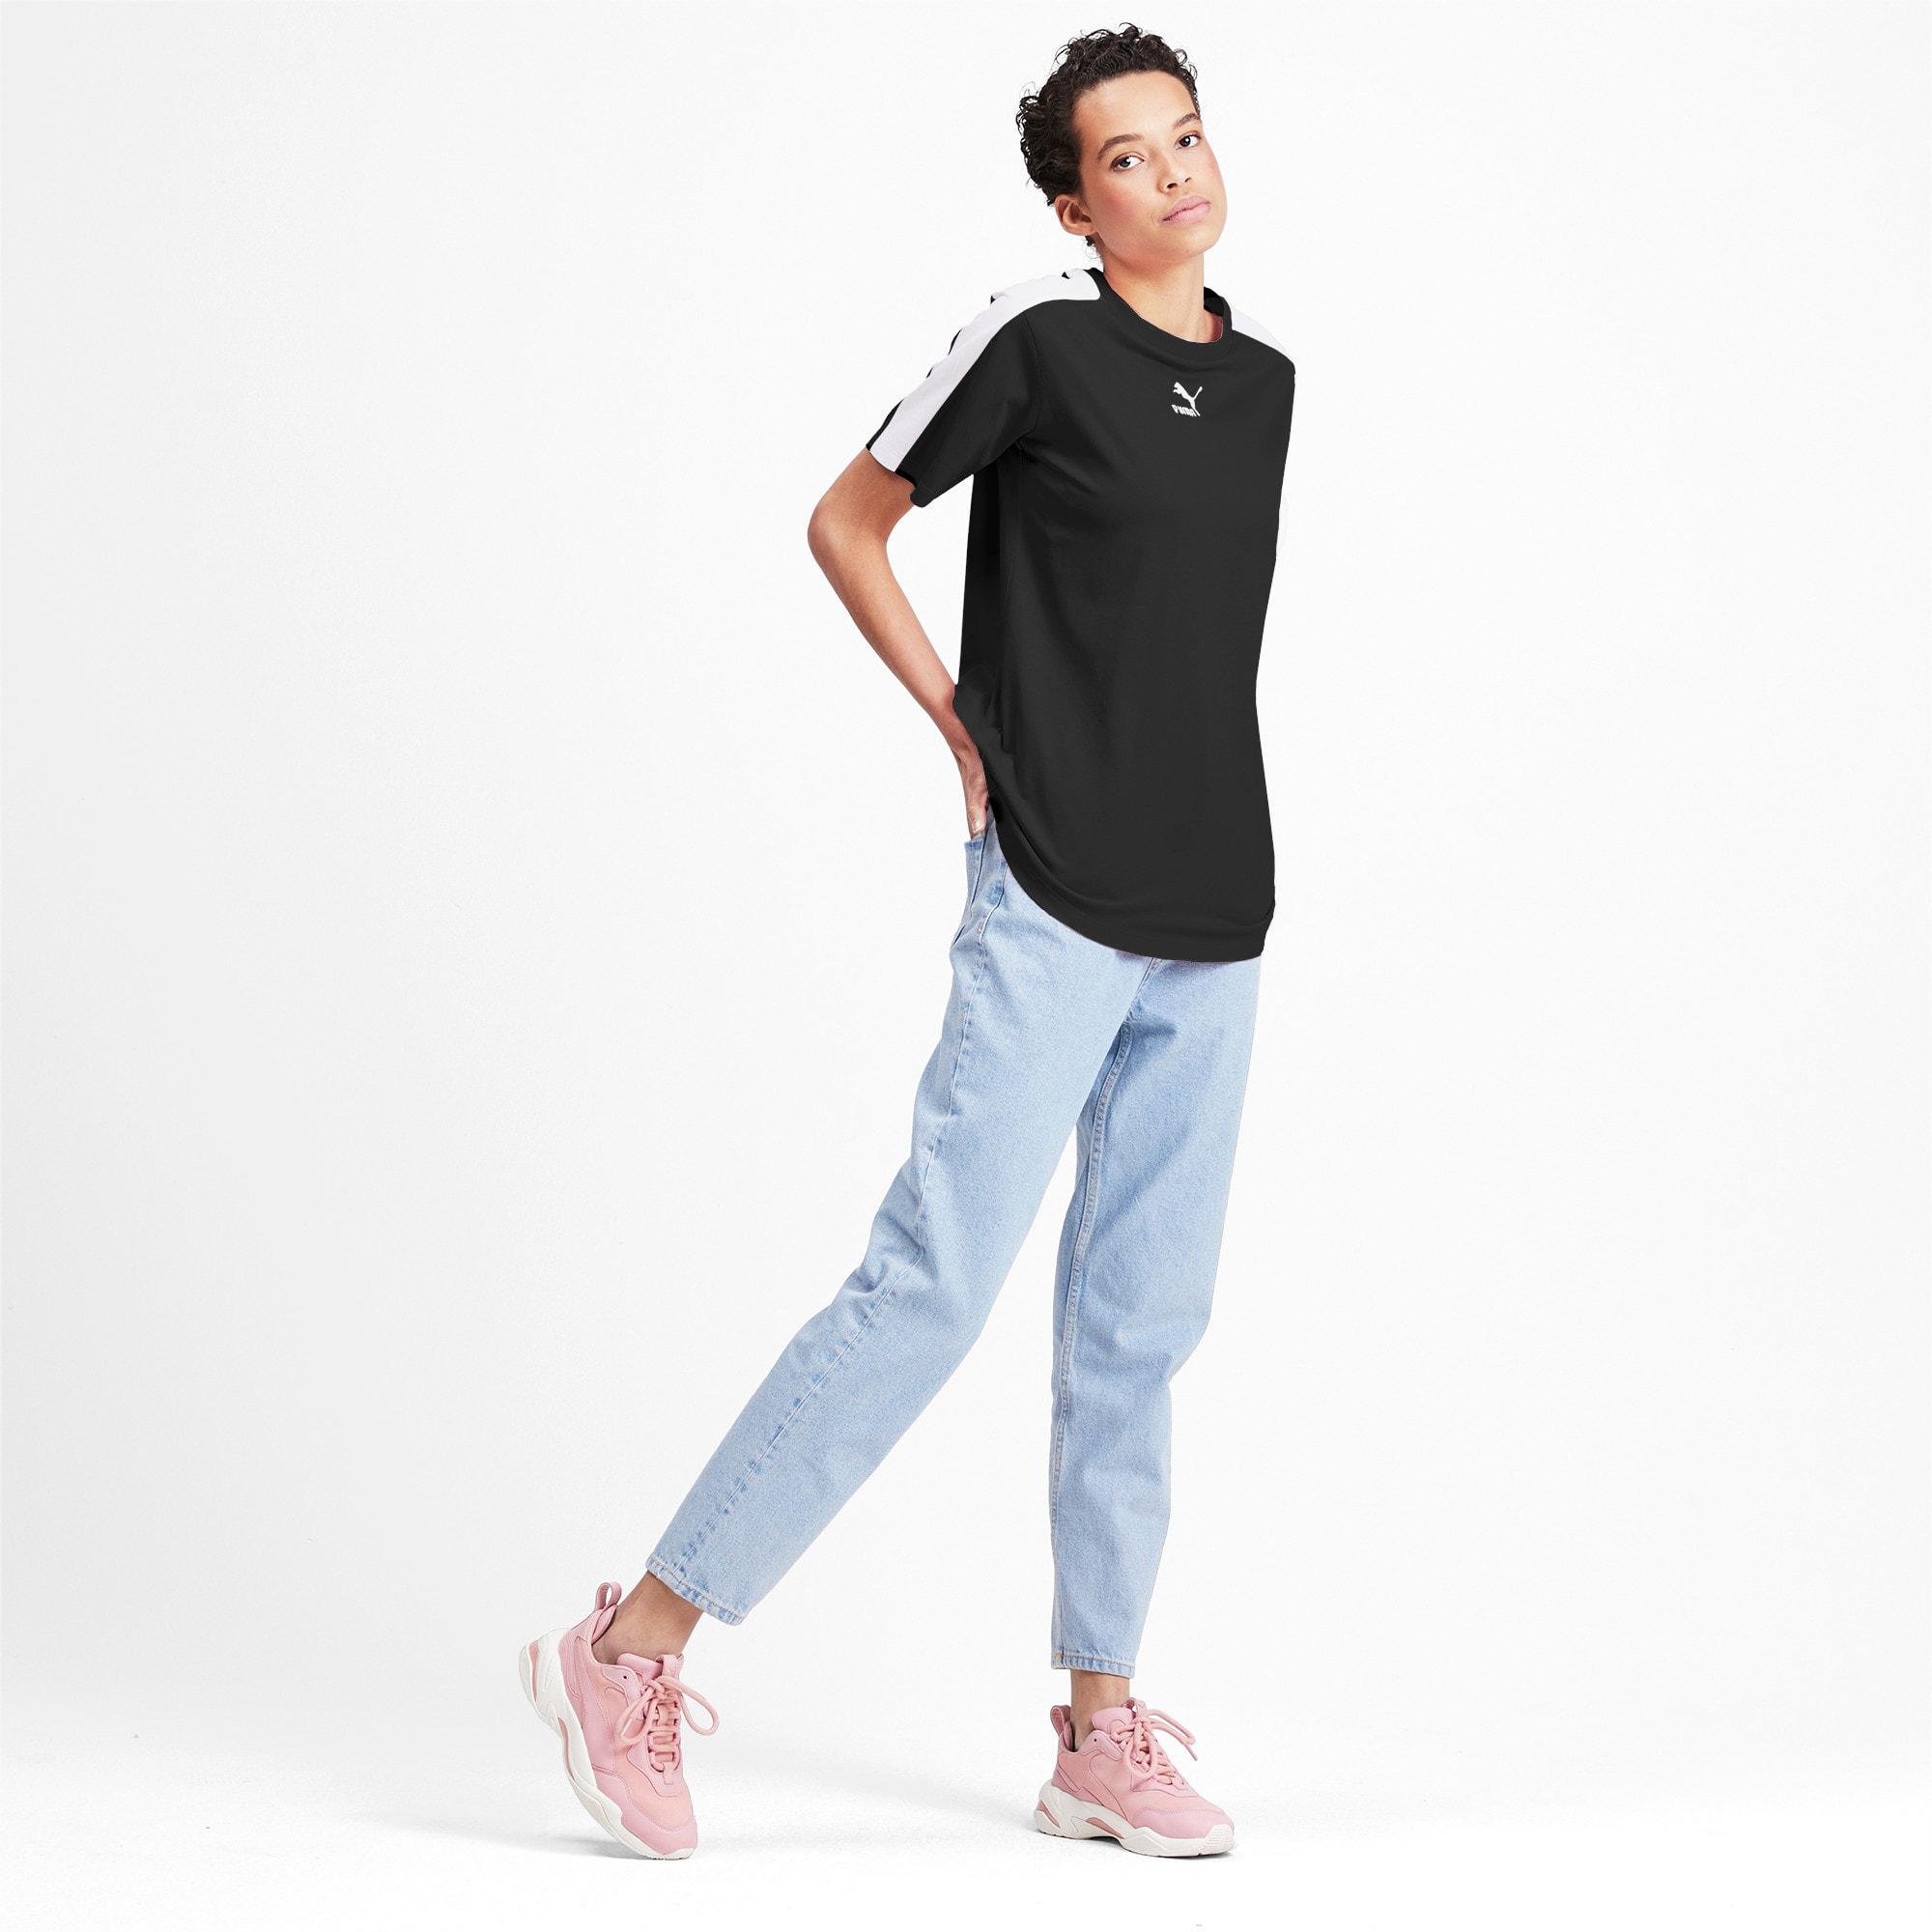 Miniatura 3 de Camiseta Classics T7 para mujer, Puma Black, mediano